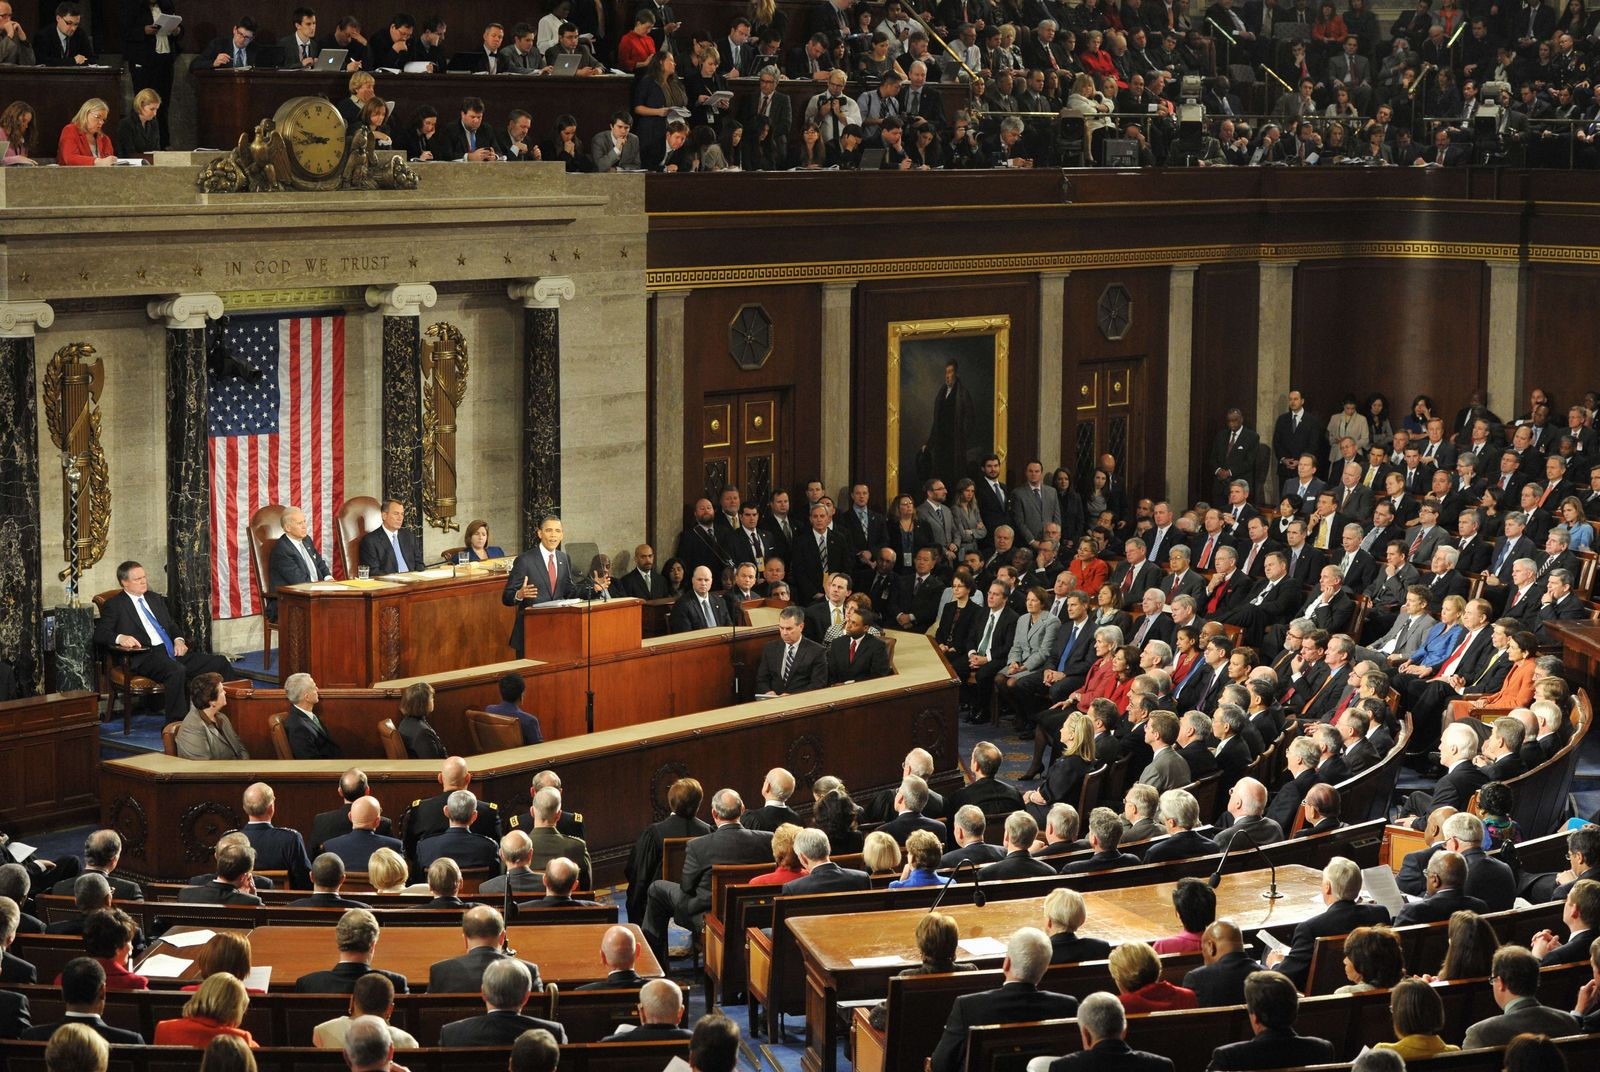 US-POLITICS-OBAMA-STATE OF THE UNION